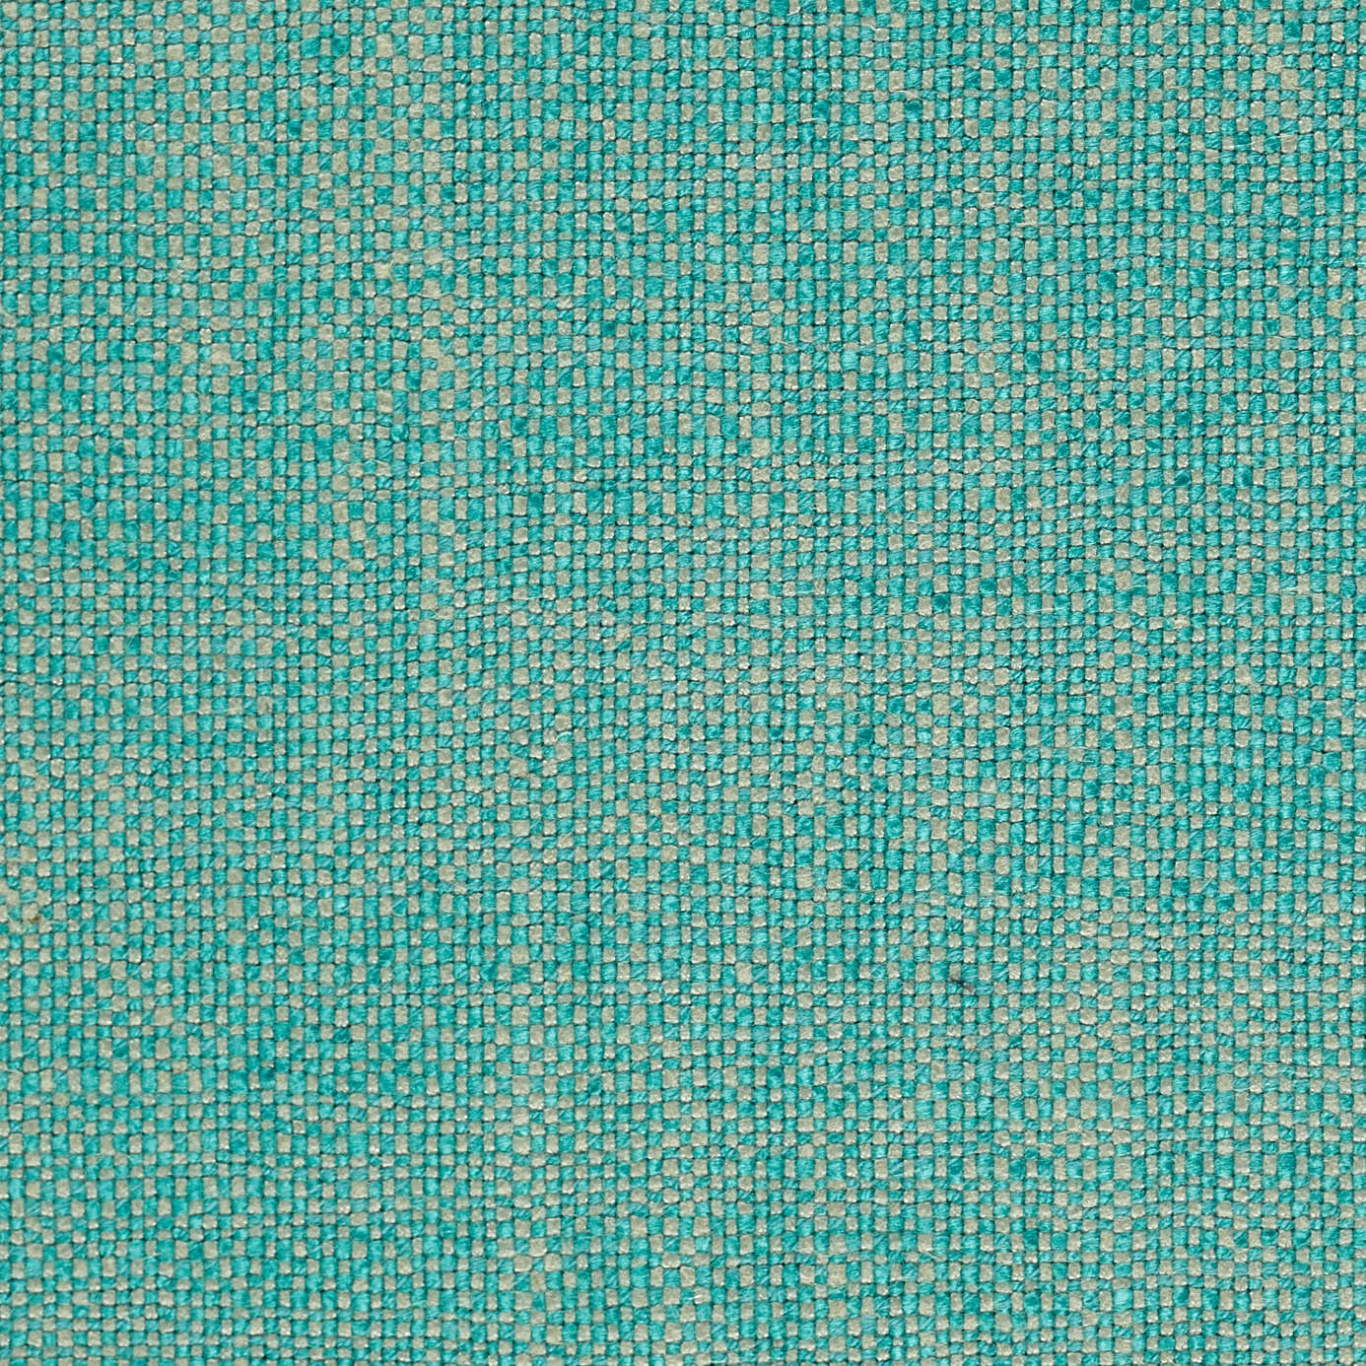 Image of Harlequin Fission Aqua Haze Fabric 440199